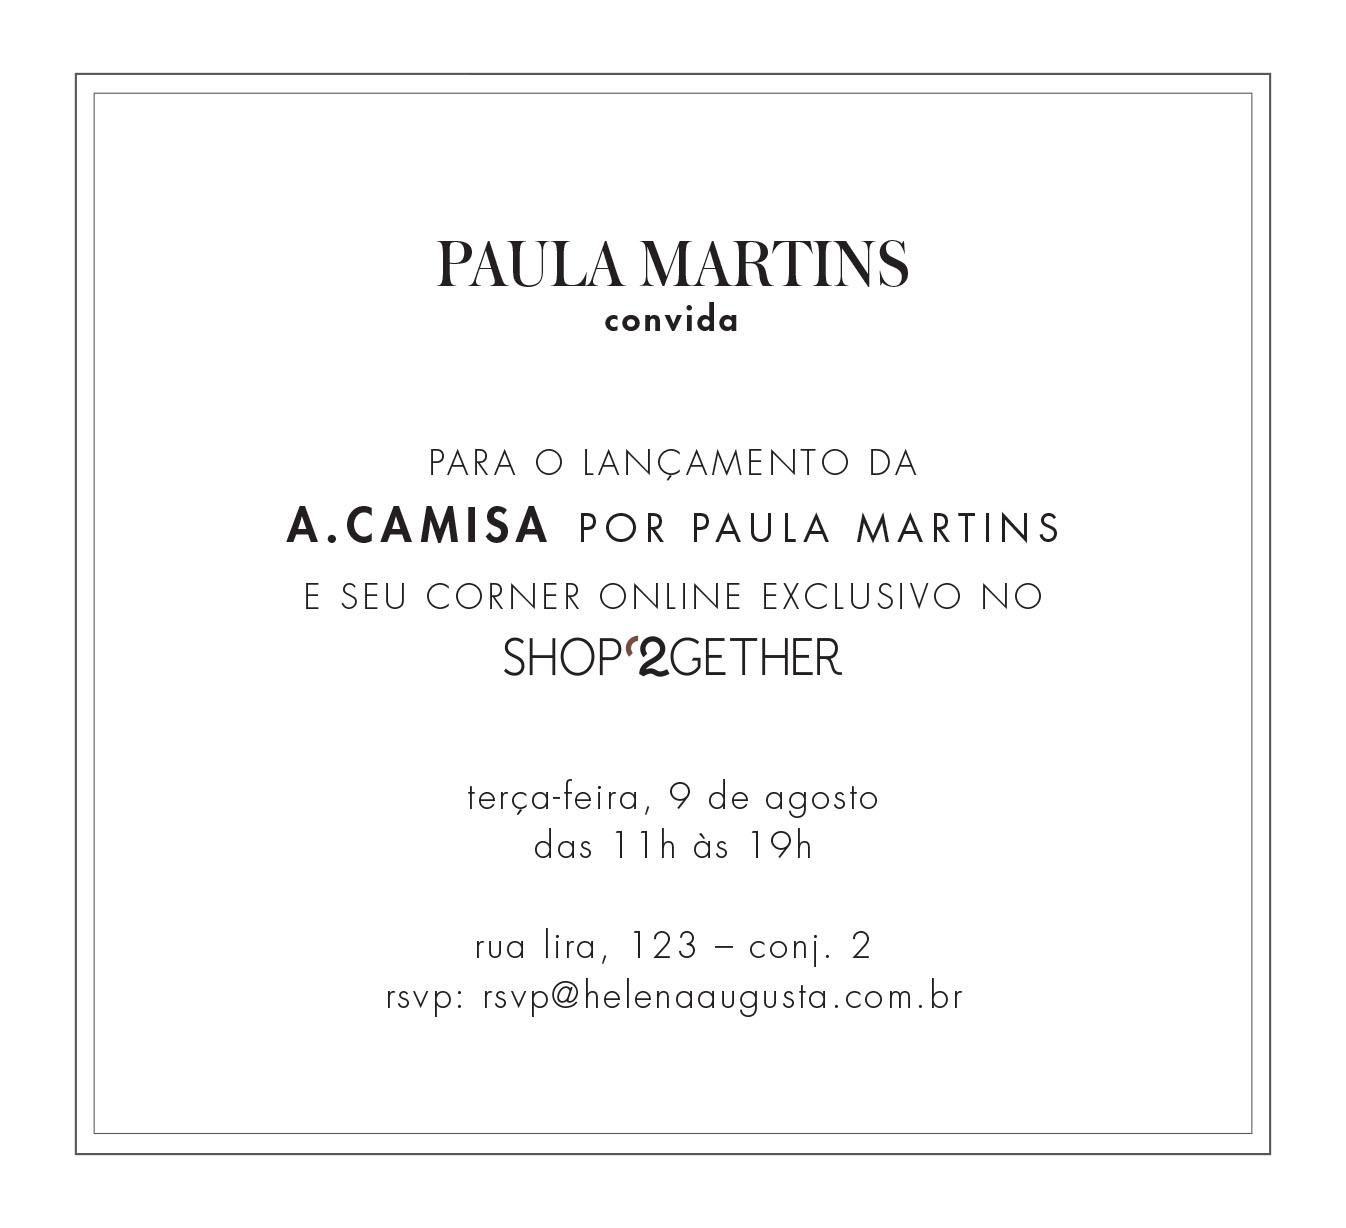 PAULA_MARTINS_4_semmarca